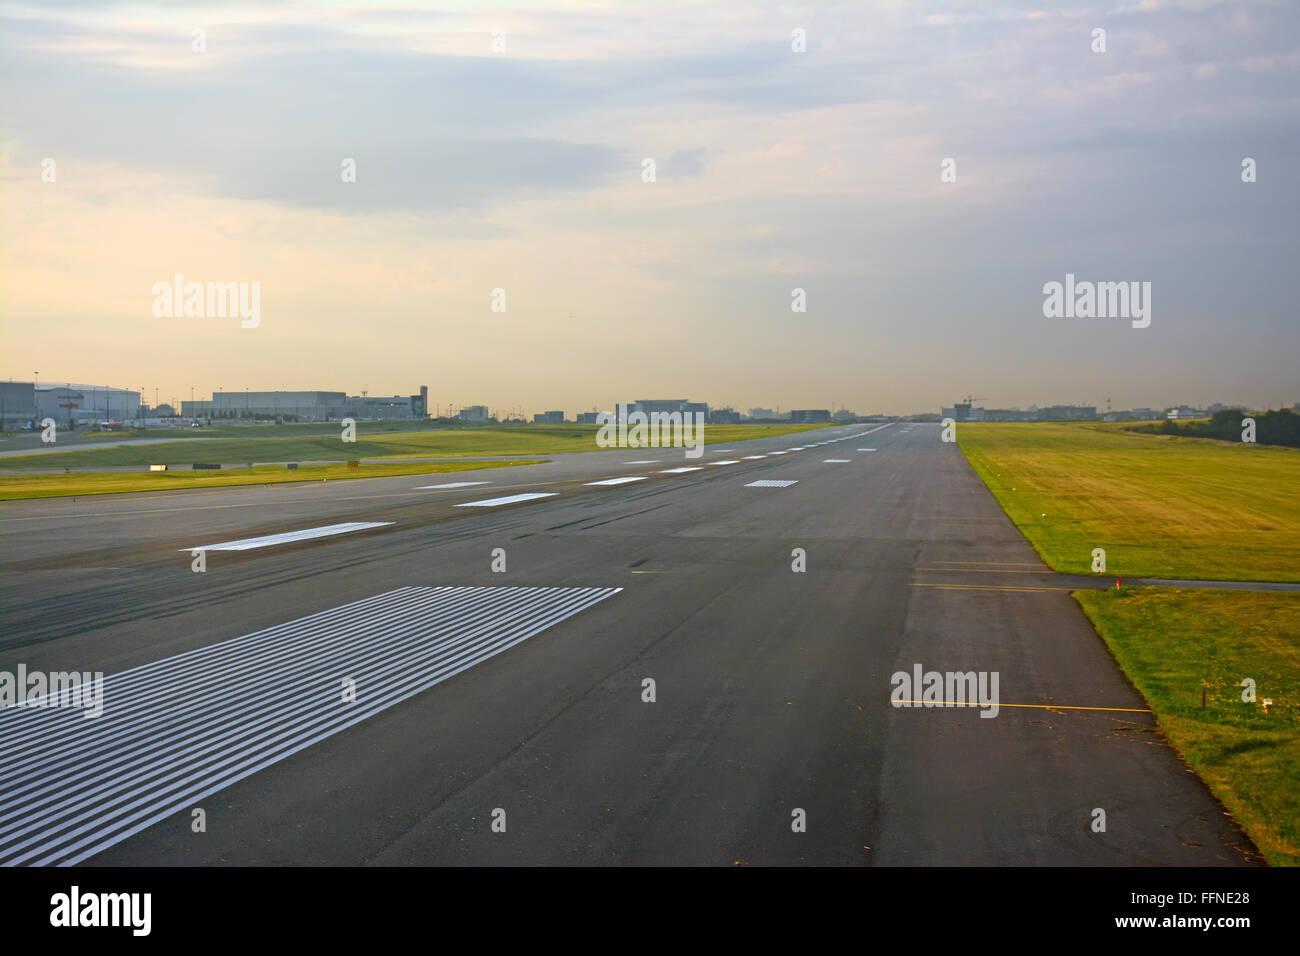 Empty  airport runway, Canada - Stock Image